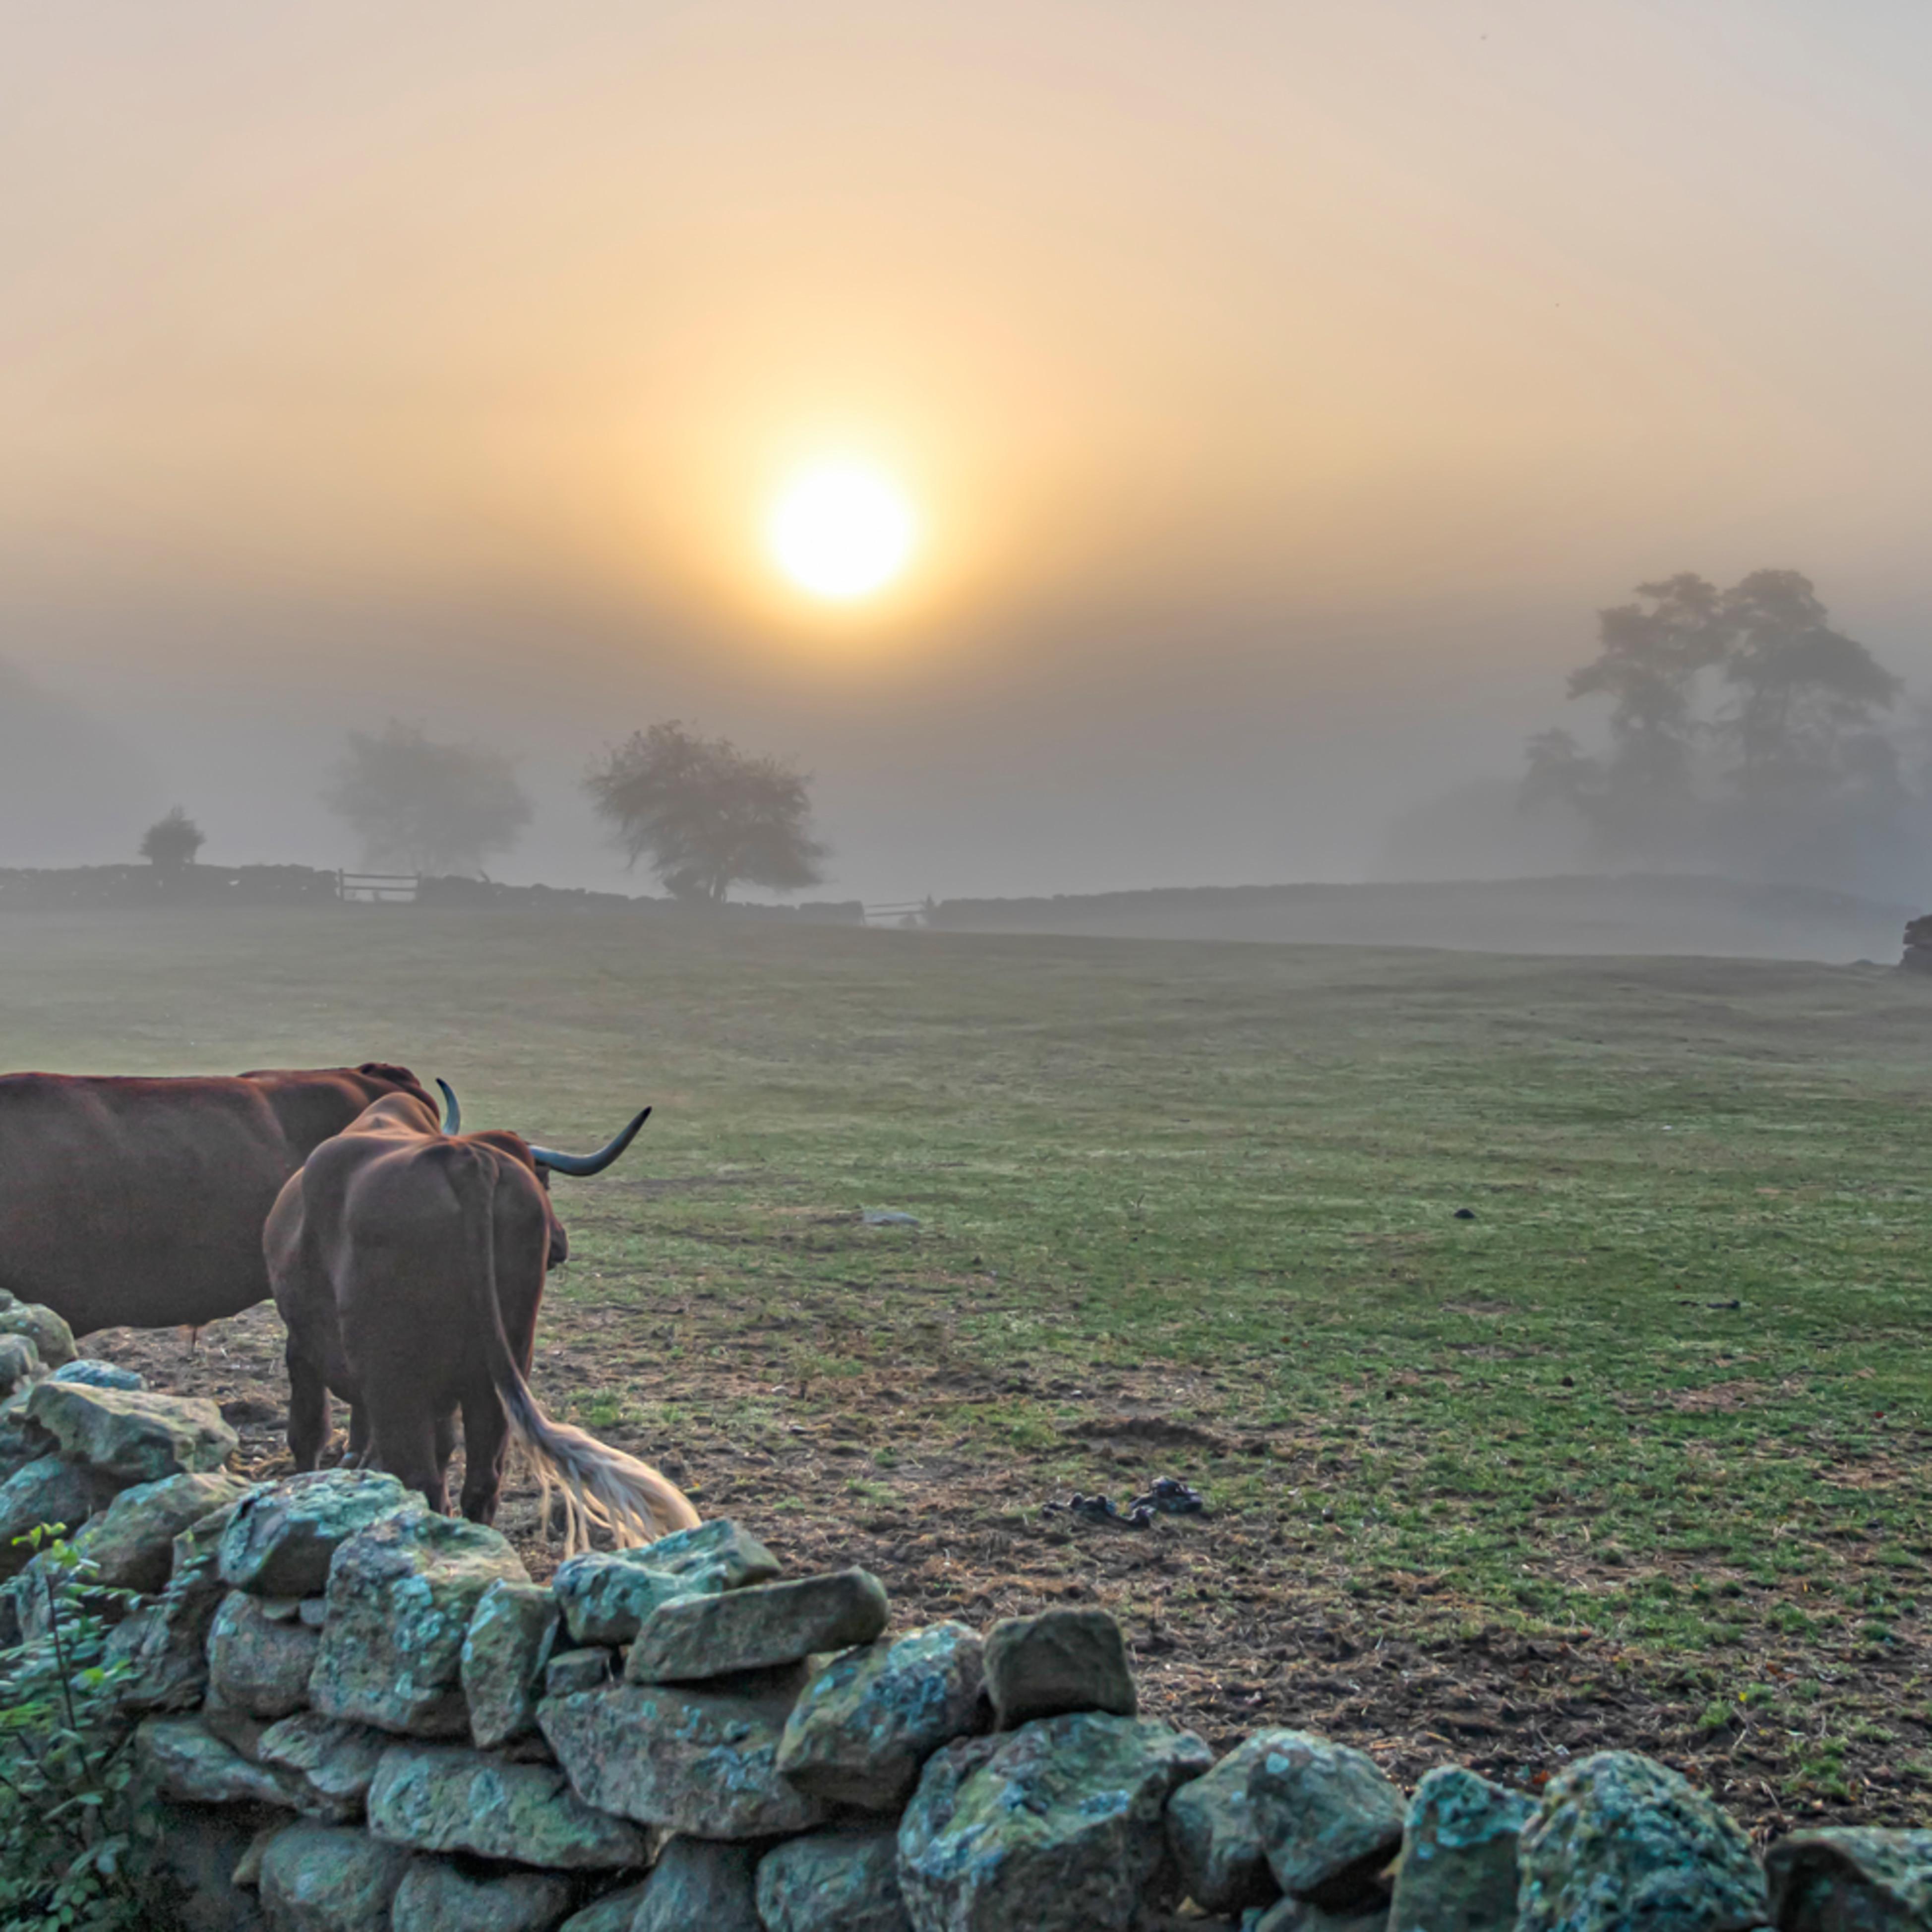 Brookside farm oxen fog yb1vwl